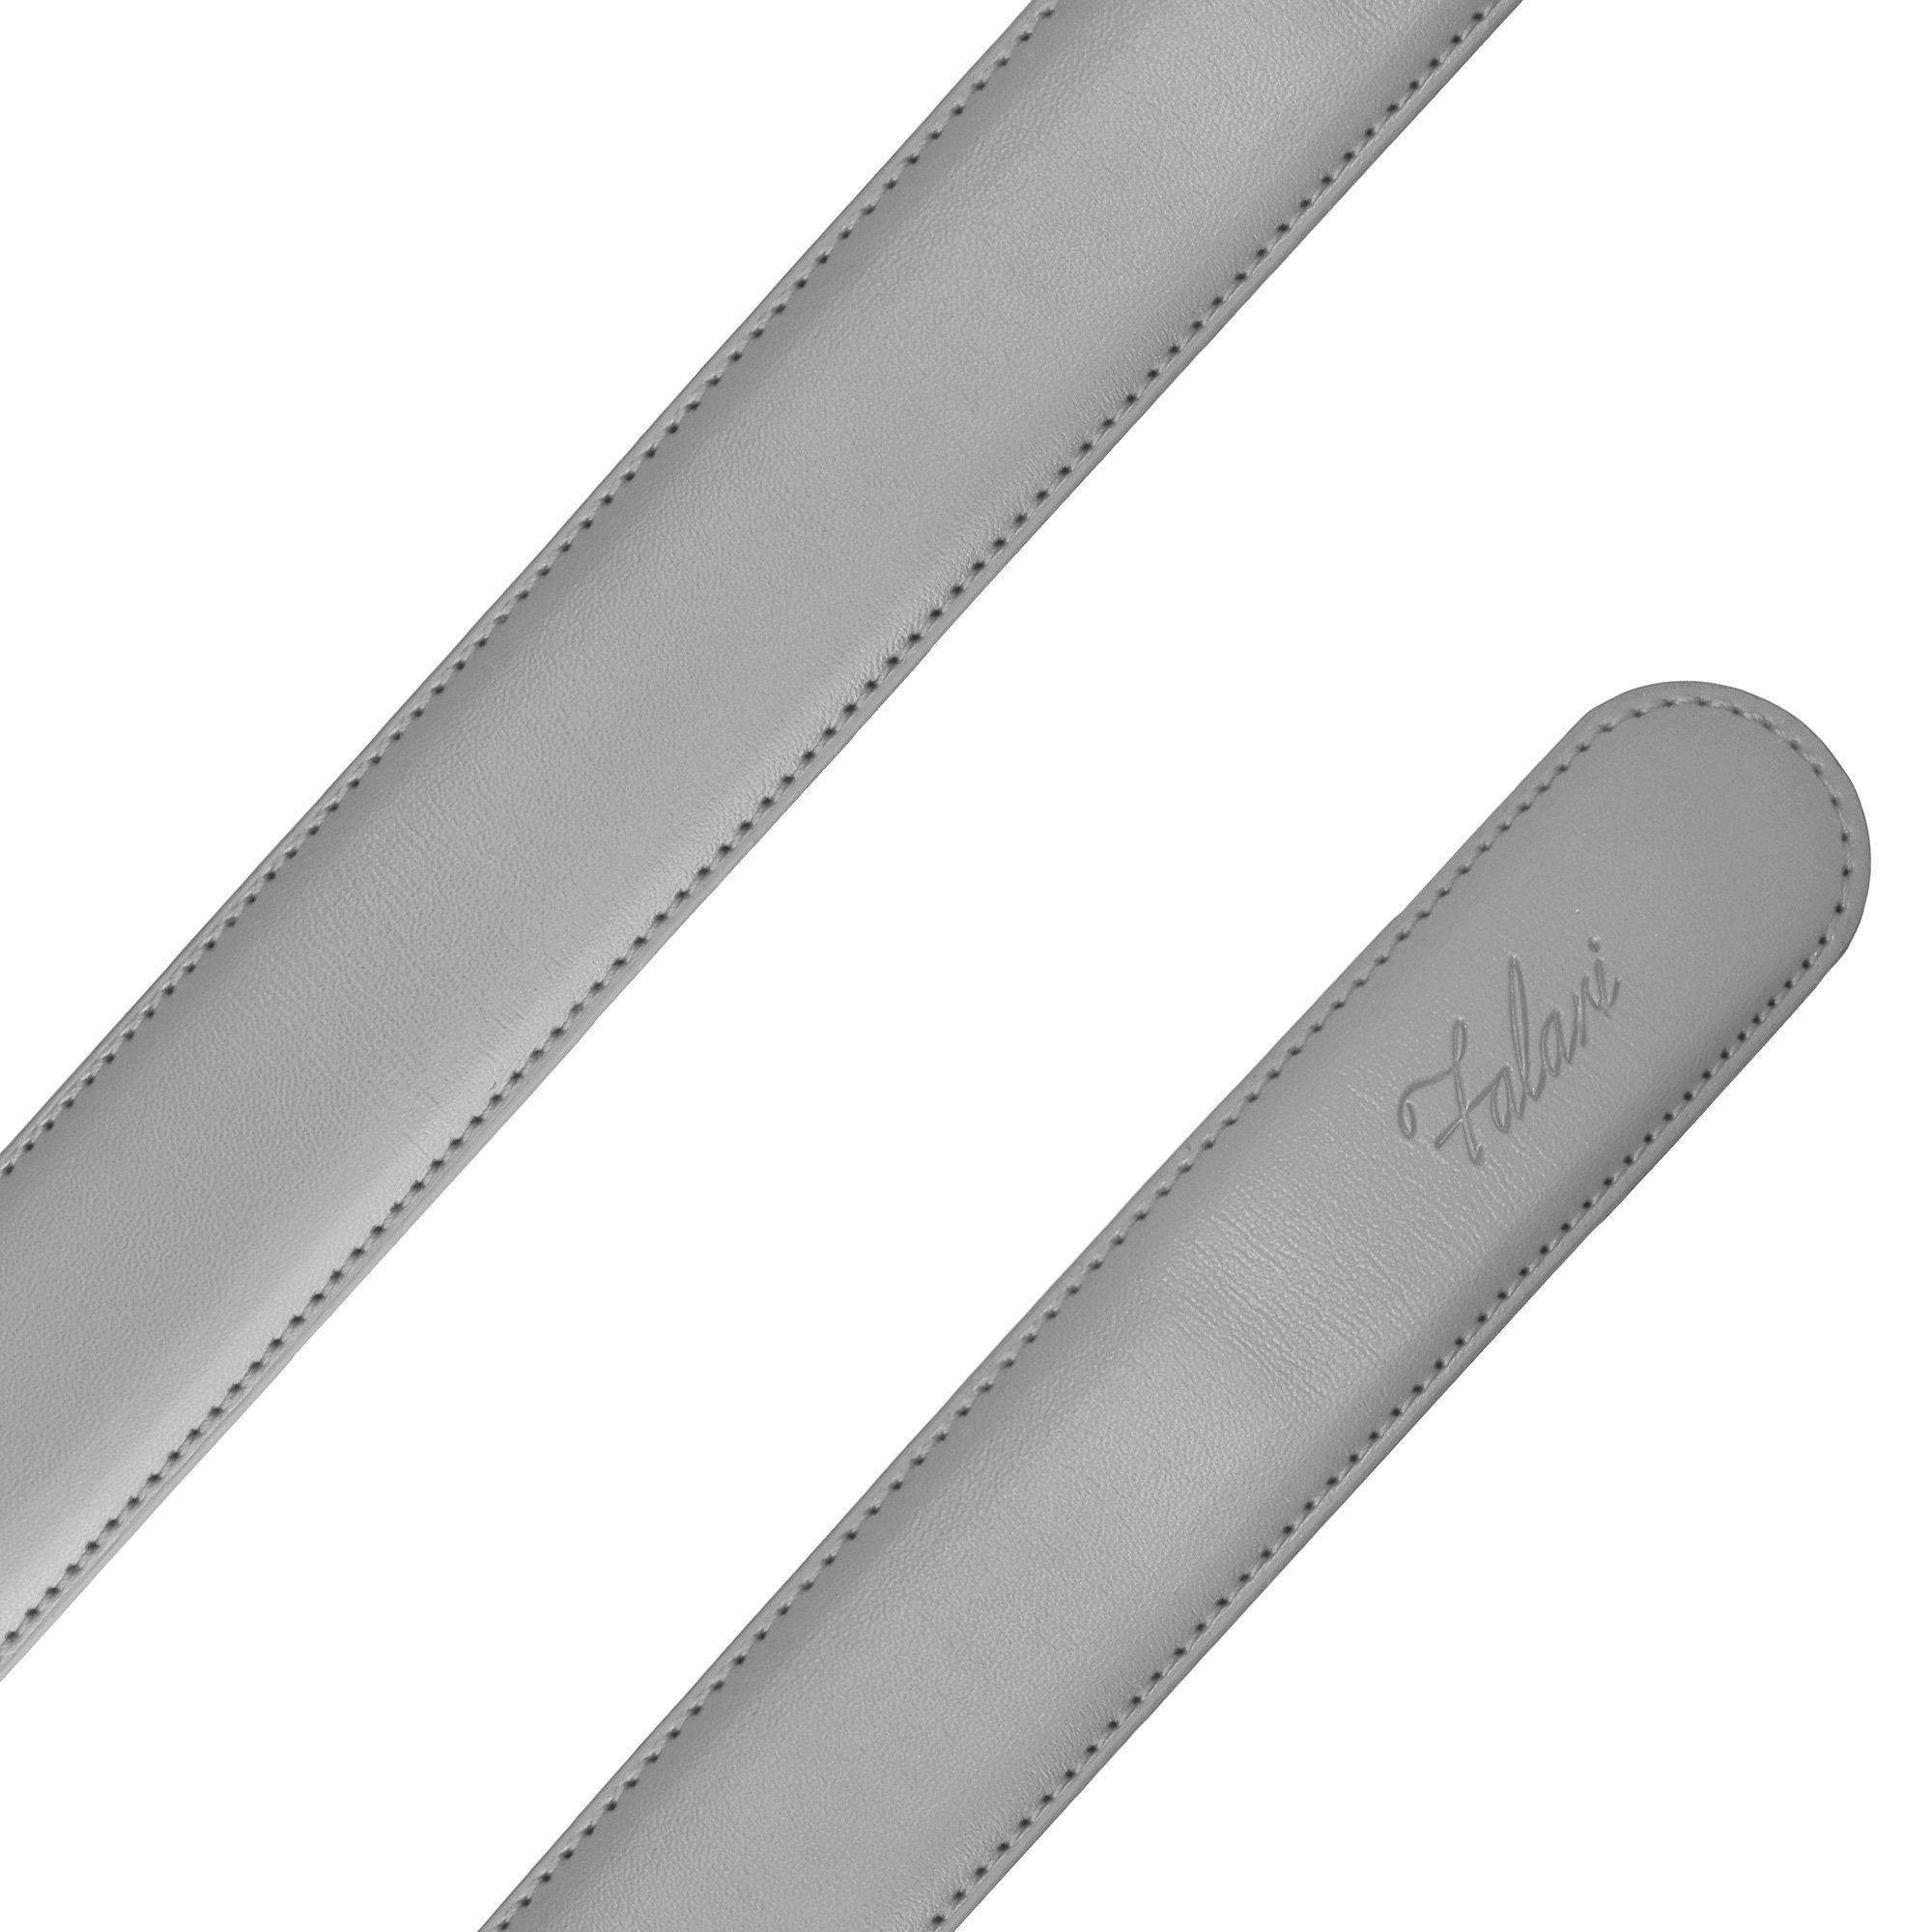 Falari Men's Leather Ratchet Belt Strap 8004-LGY-L40 by Falari (Image #4)